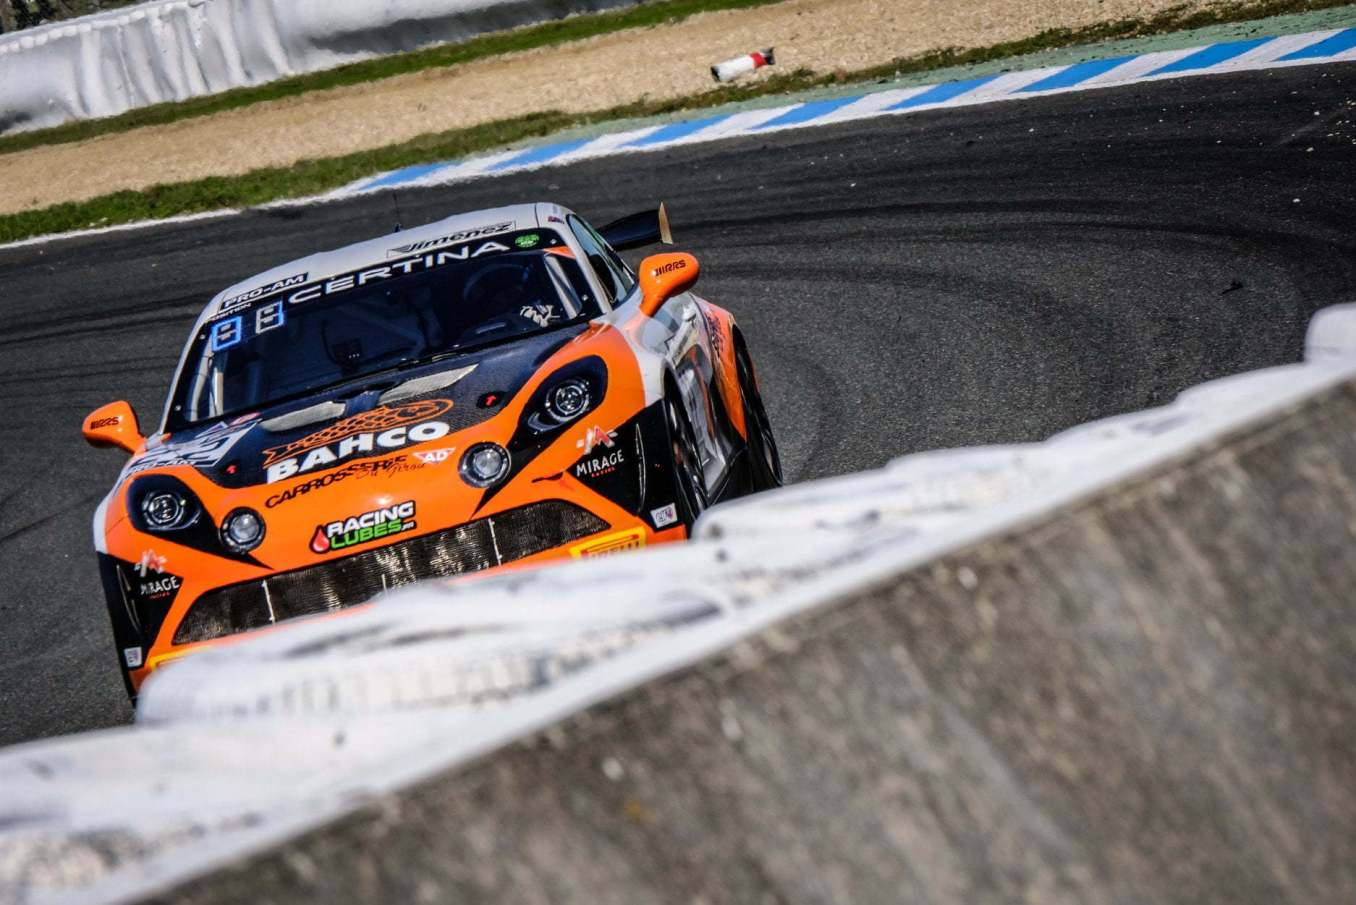 Alpine A110 GT4 FFSA GT 2020 Albi Course 2 7 | Alpine A110 GT4 : Herrero et Moullin-Traffort performent à Albi !